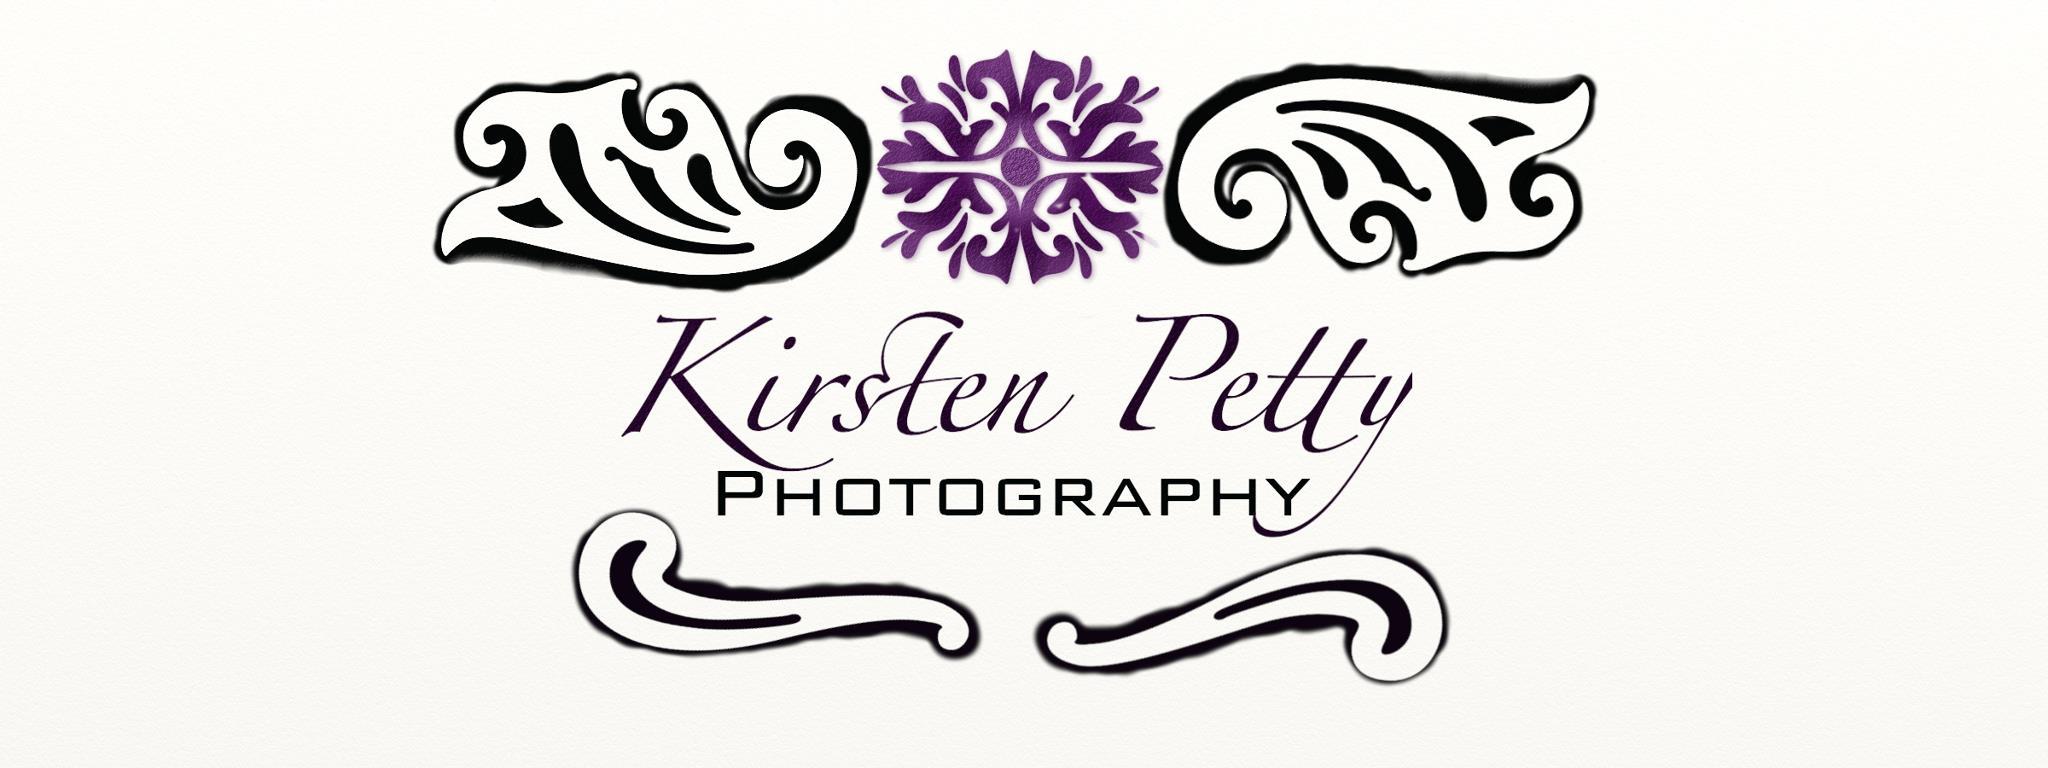 Kirsten Petty Photography